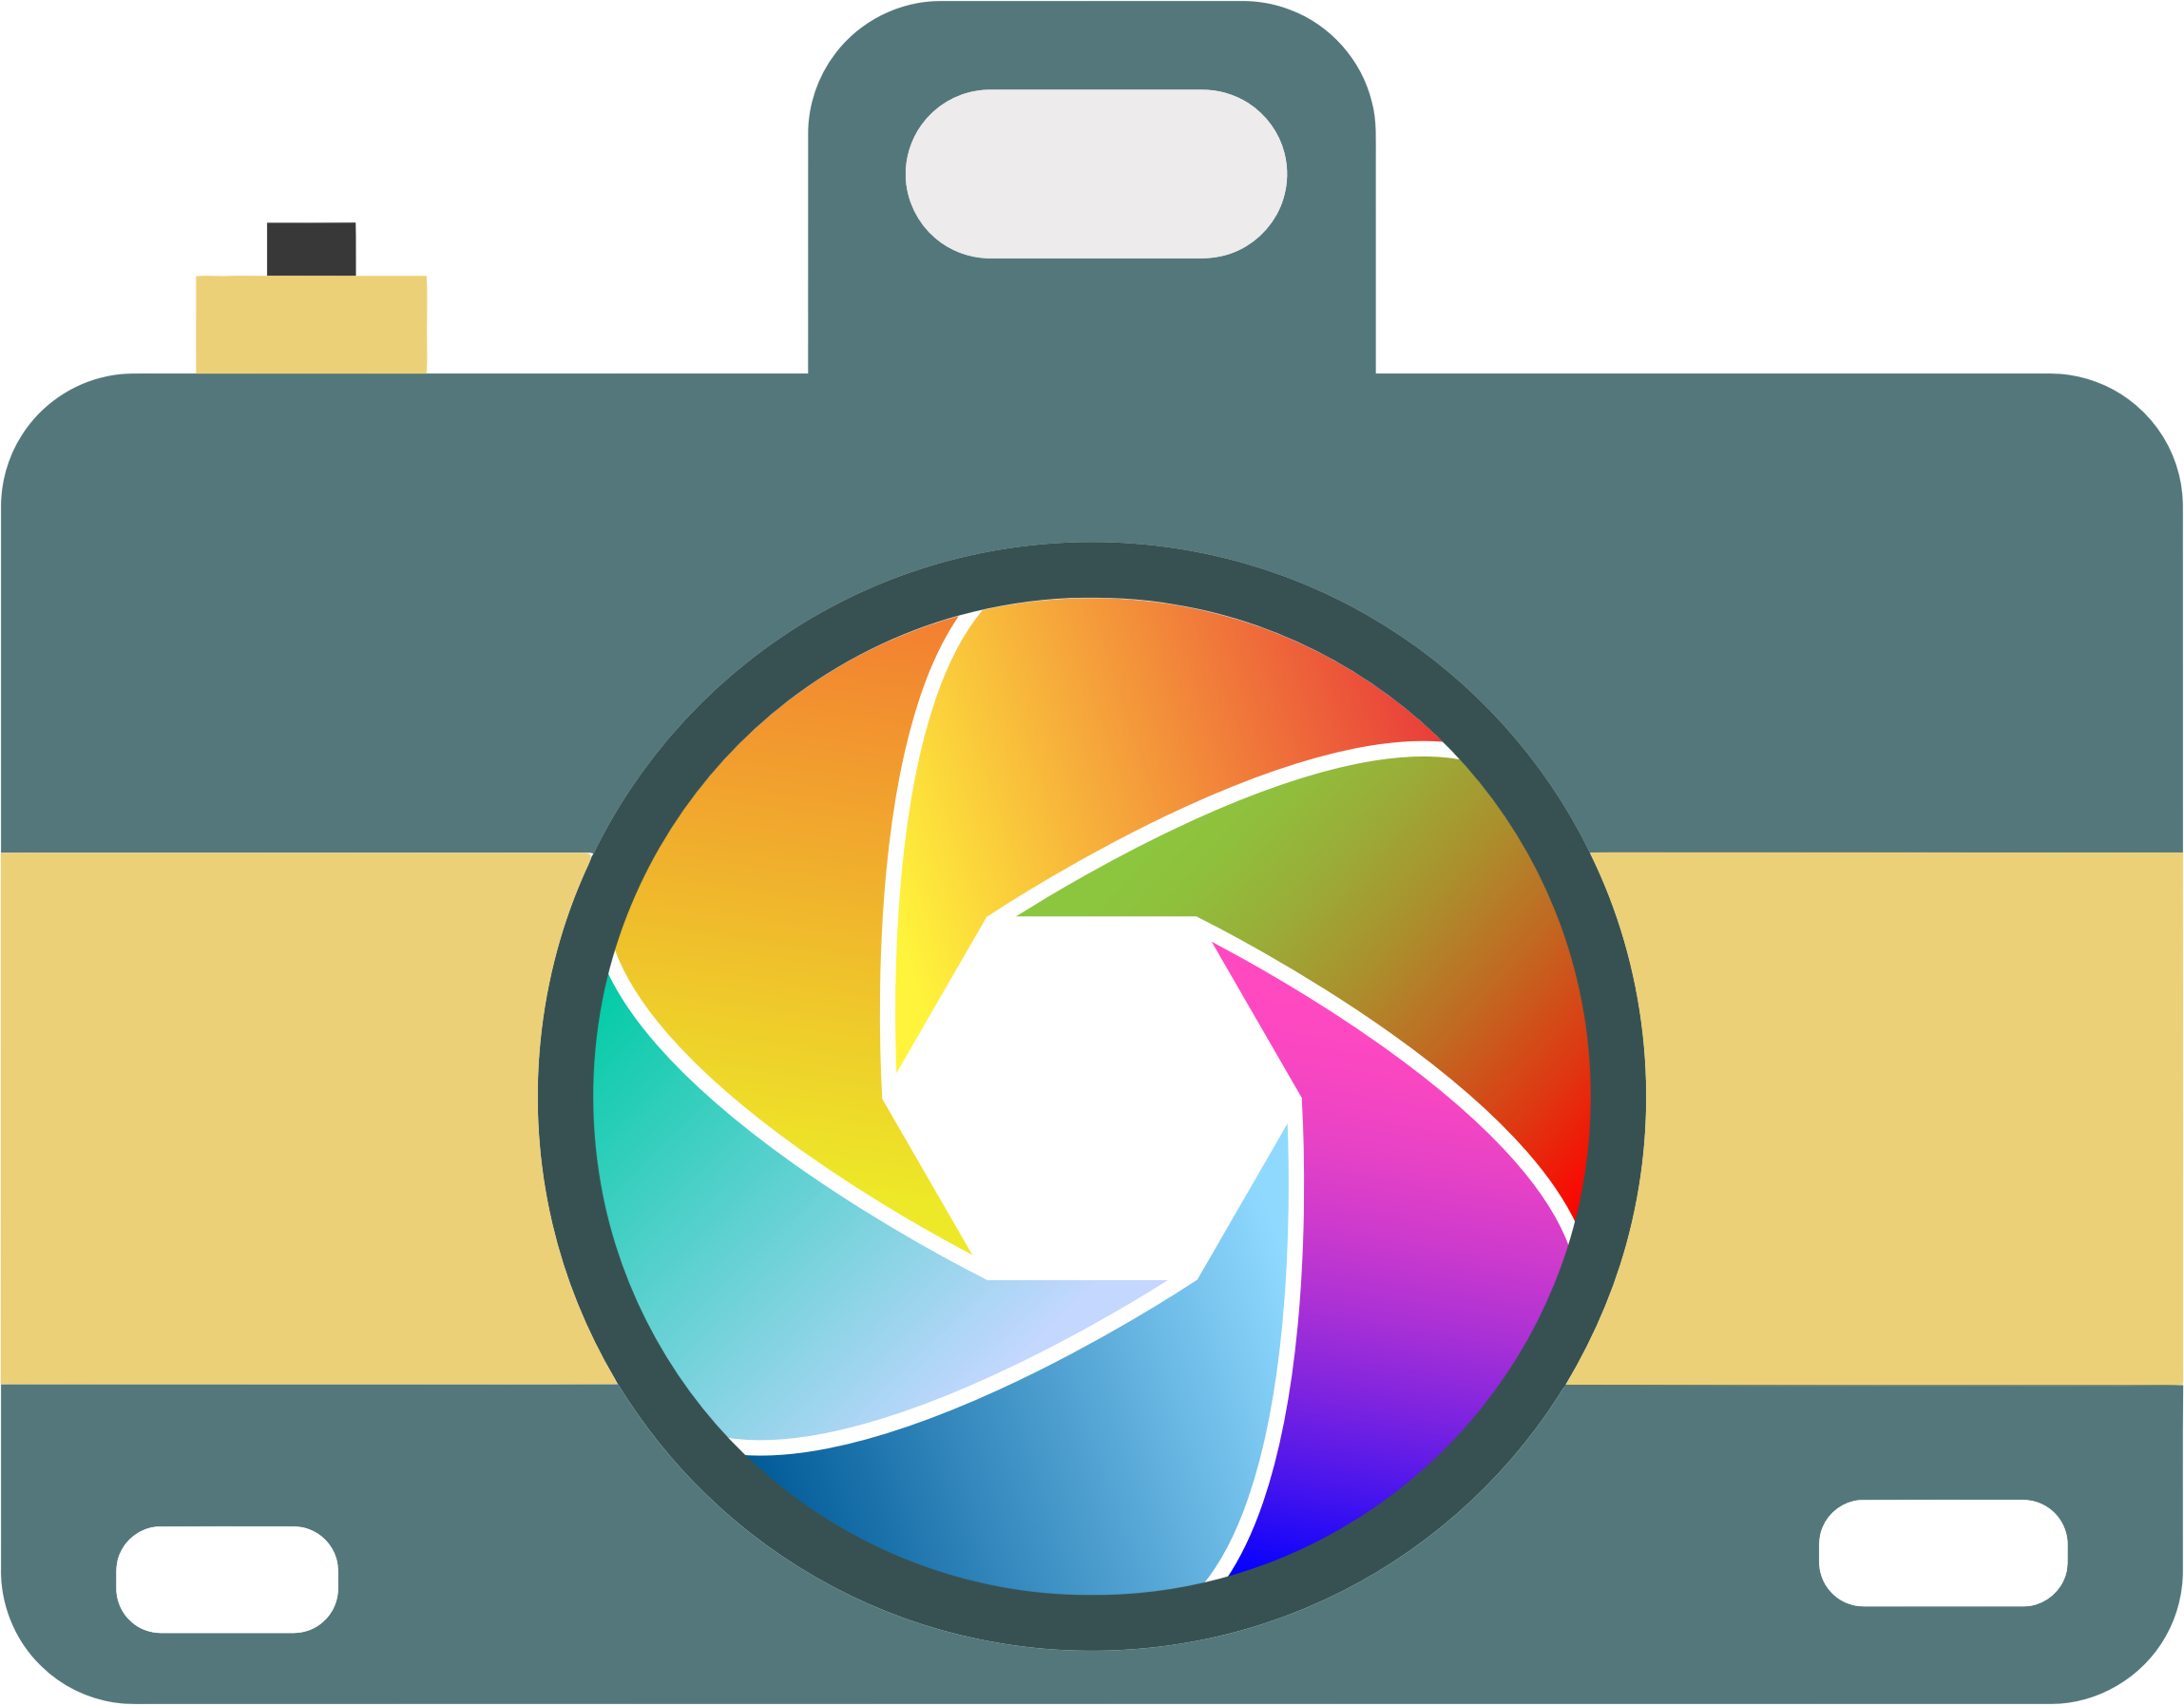 Design clipart camera. Icon with colorful shutter